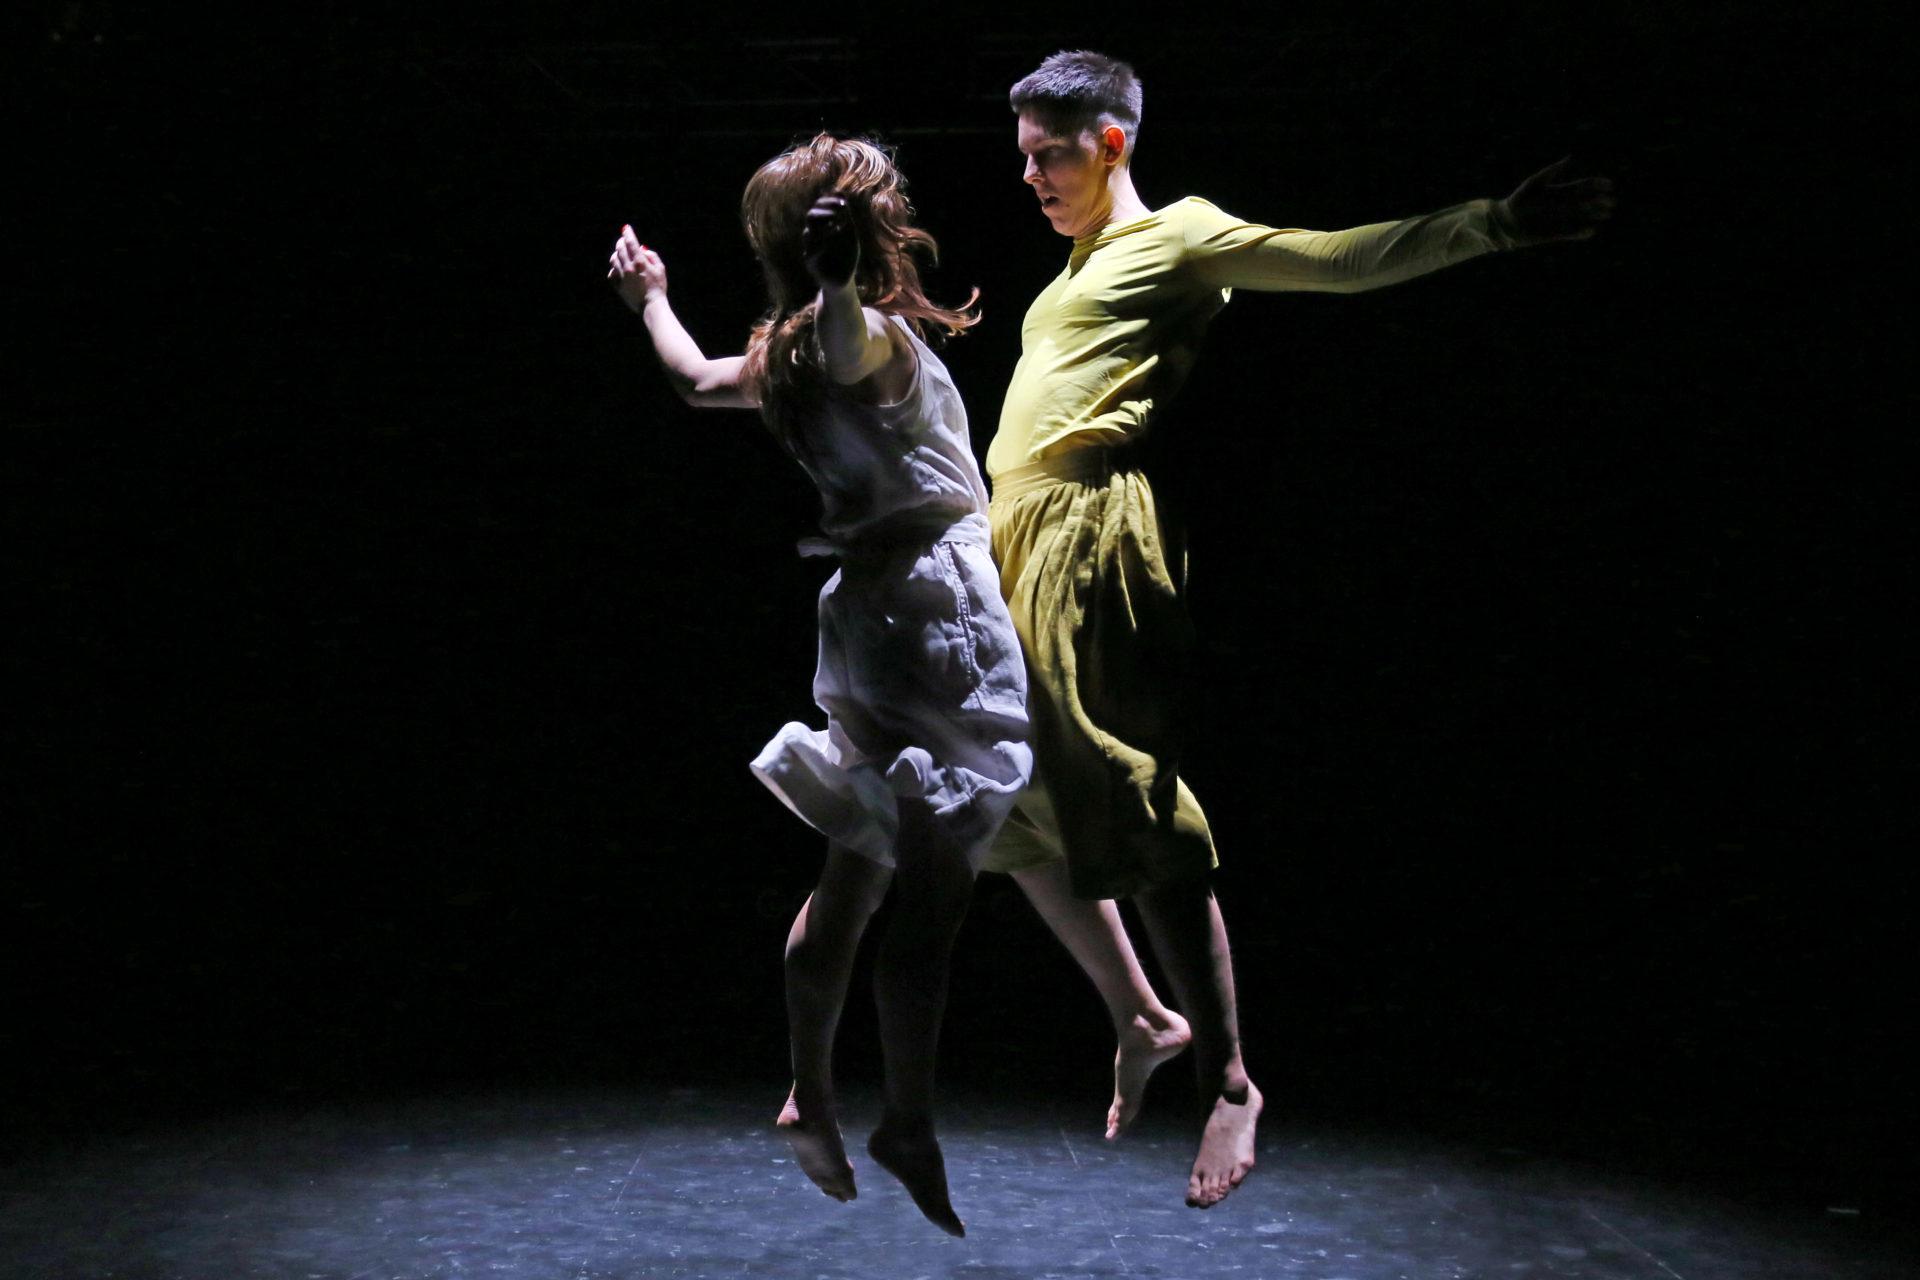 Dance_Forever_Fernanda_Ortiz_AnjaBeutler.de_318